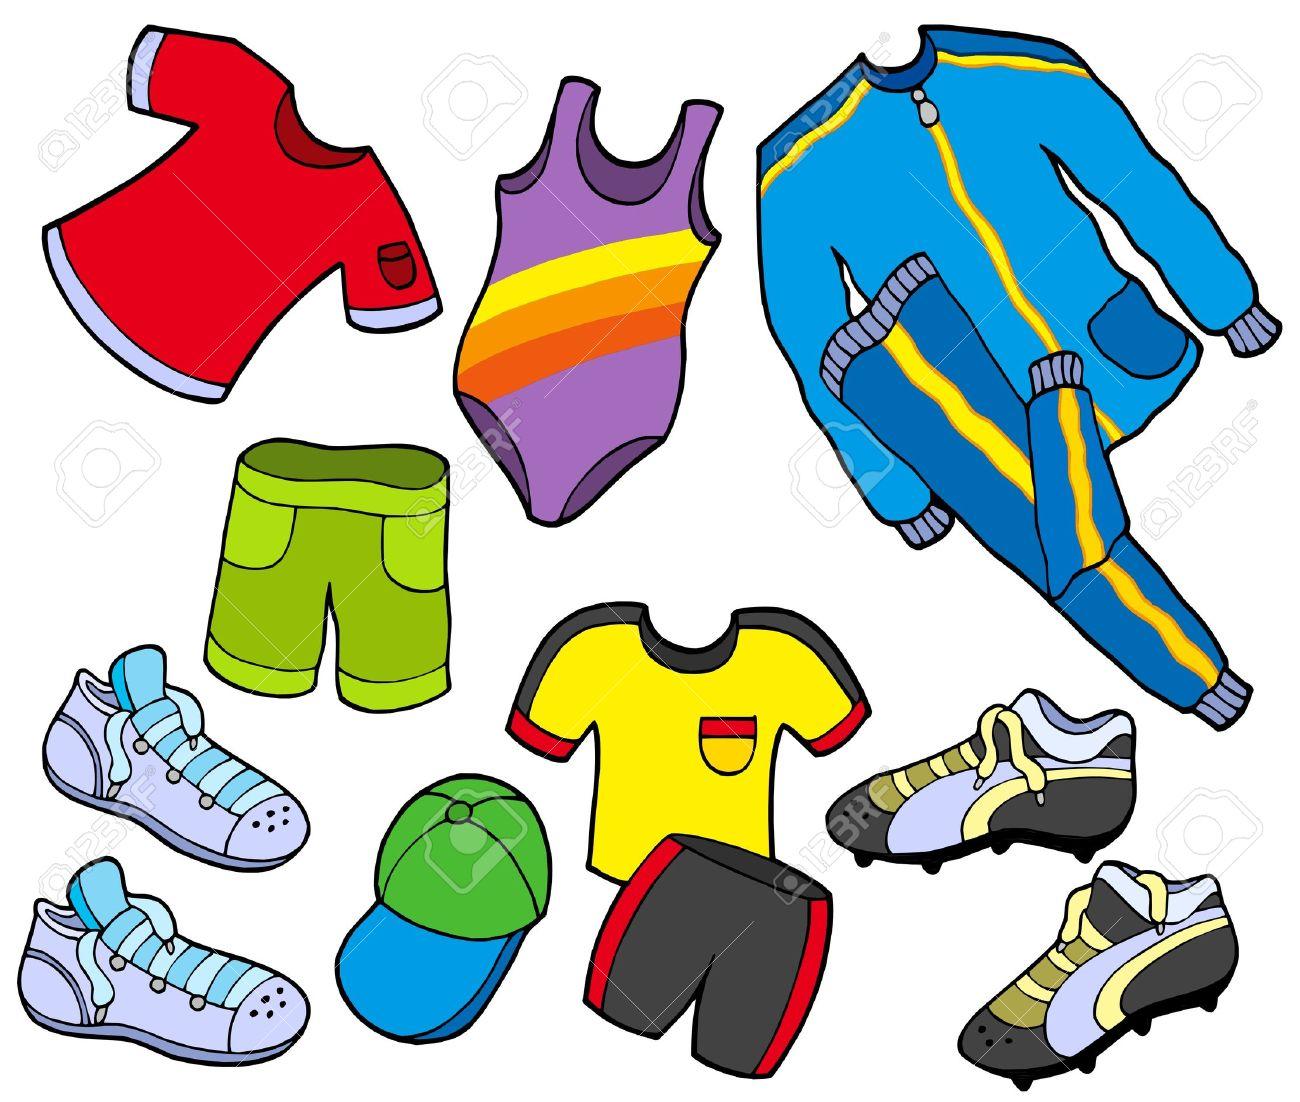 Sports Clothes Clipart #1-Sports Clothes Clipart #1-8